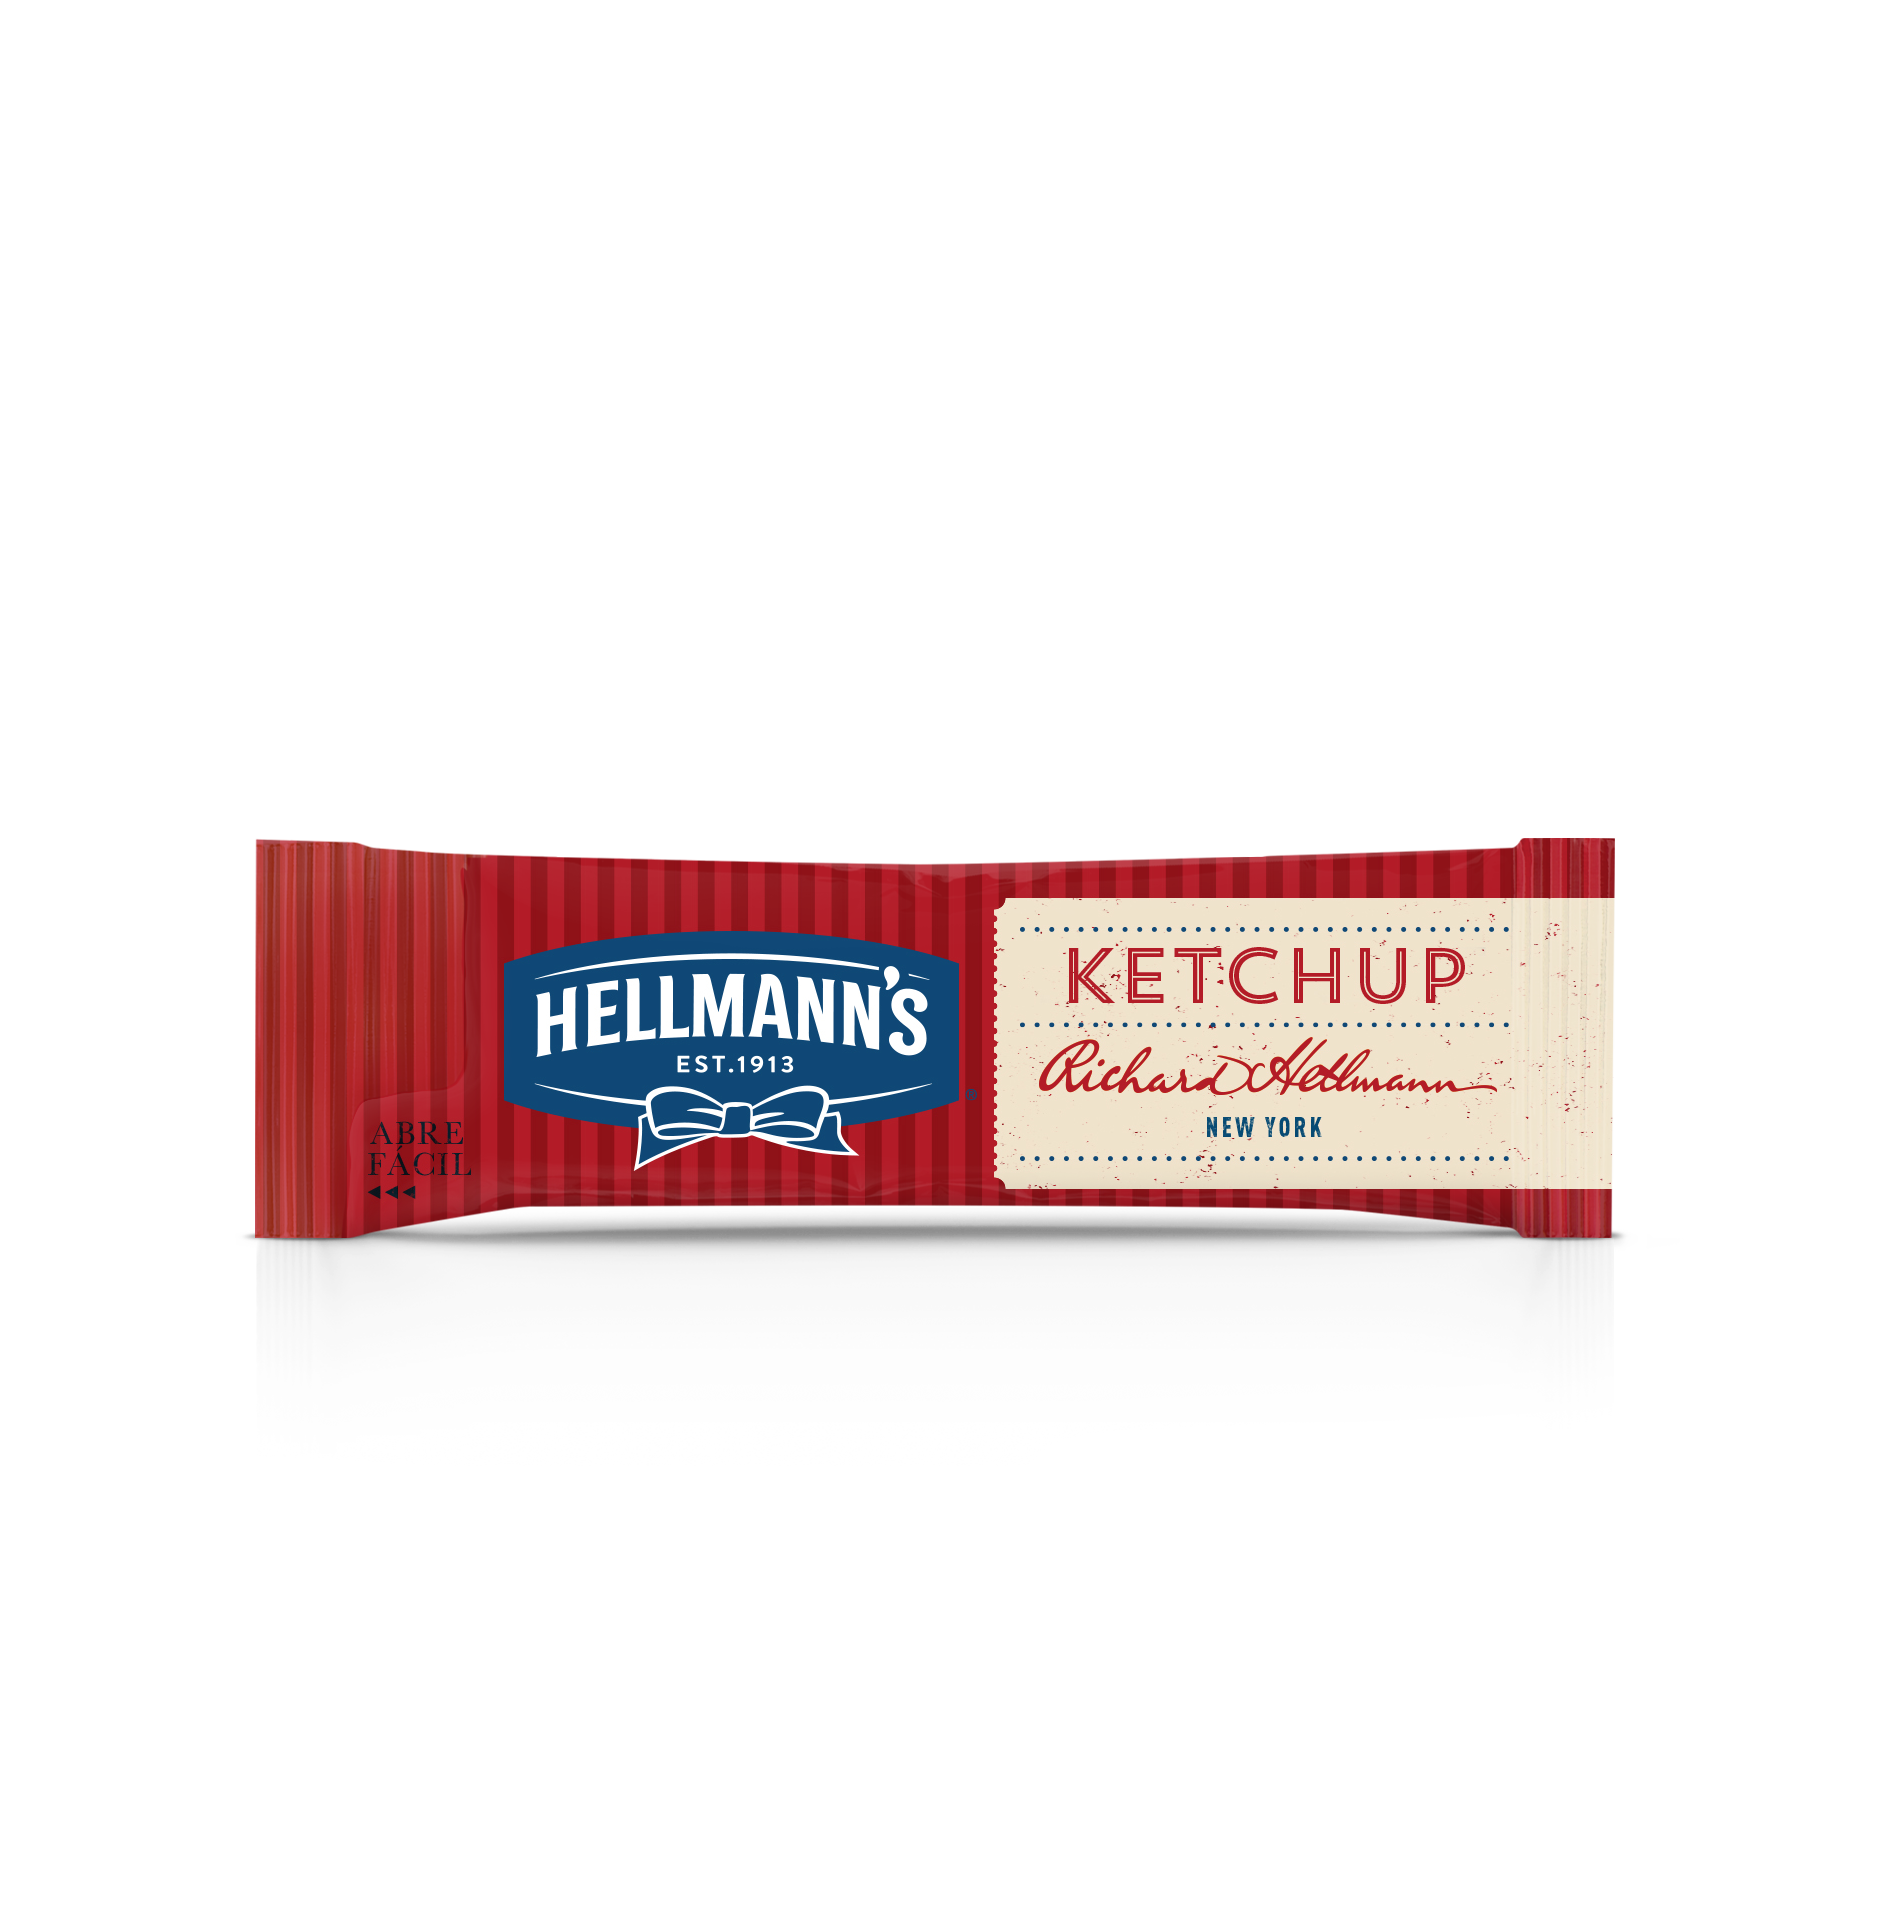 Ketchup Hellmann's - Sachê 'Abre Fácil' 10g